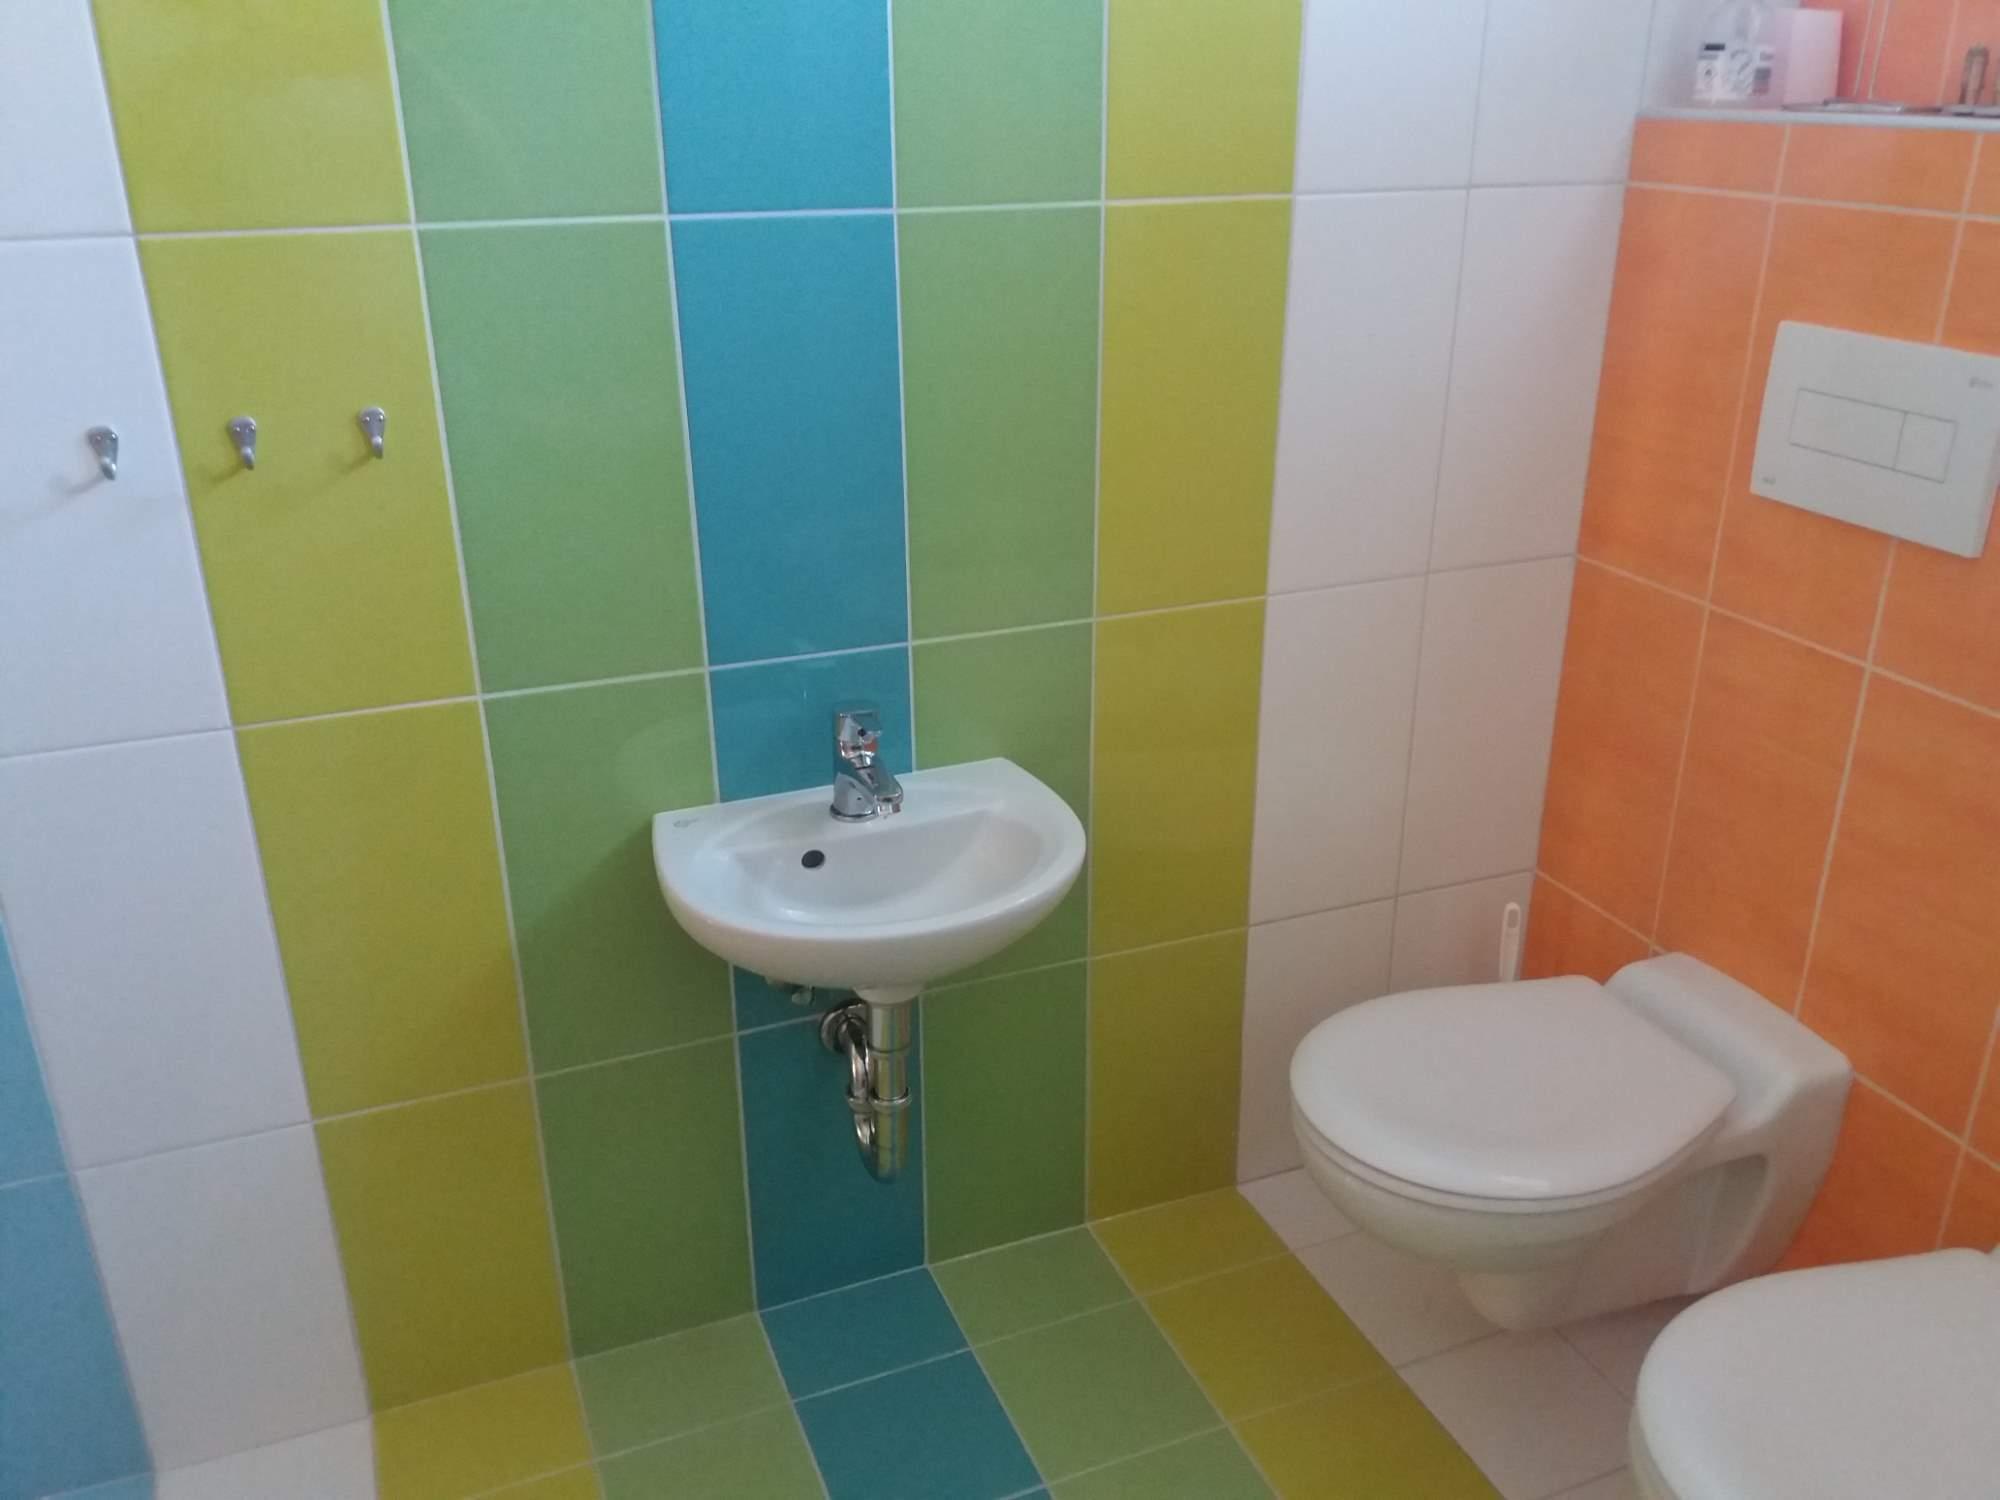 rajce.idnes.cz. toilet drkula - Idnes